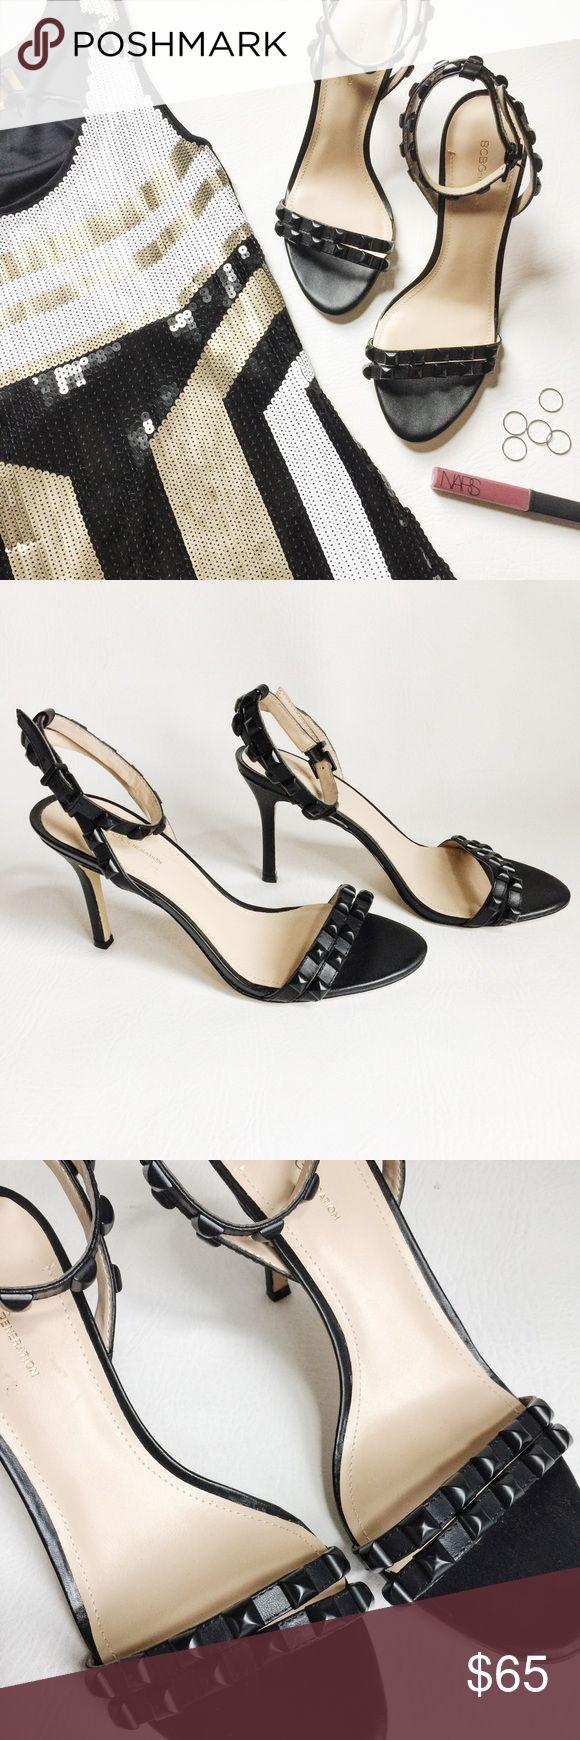 the 25+ best studded heels ideas on pinterest | valentino studded